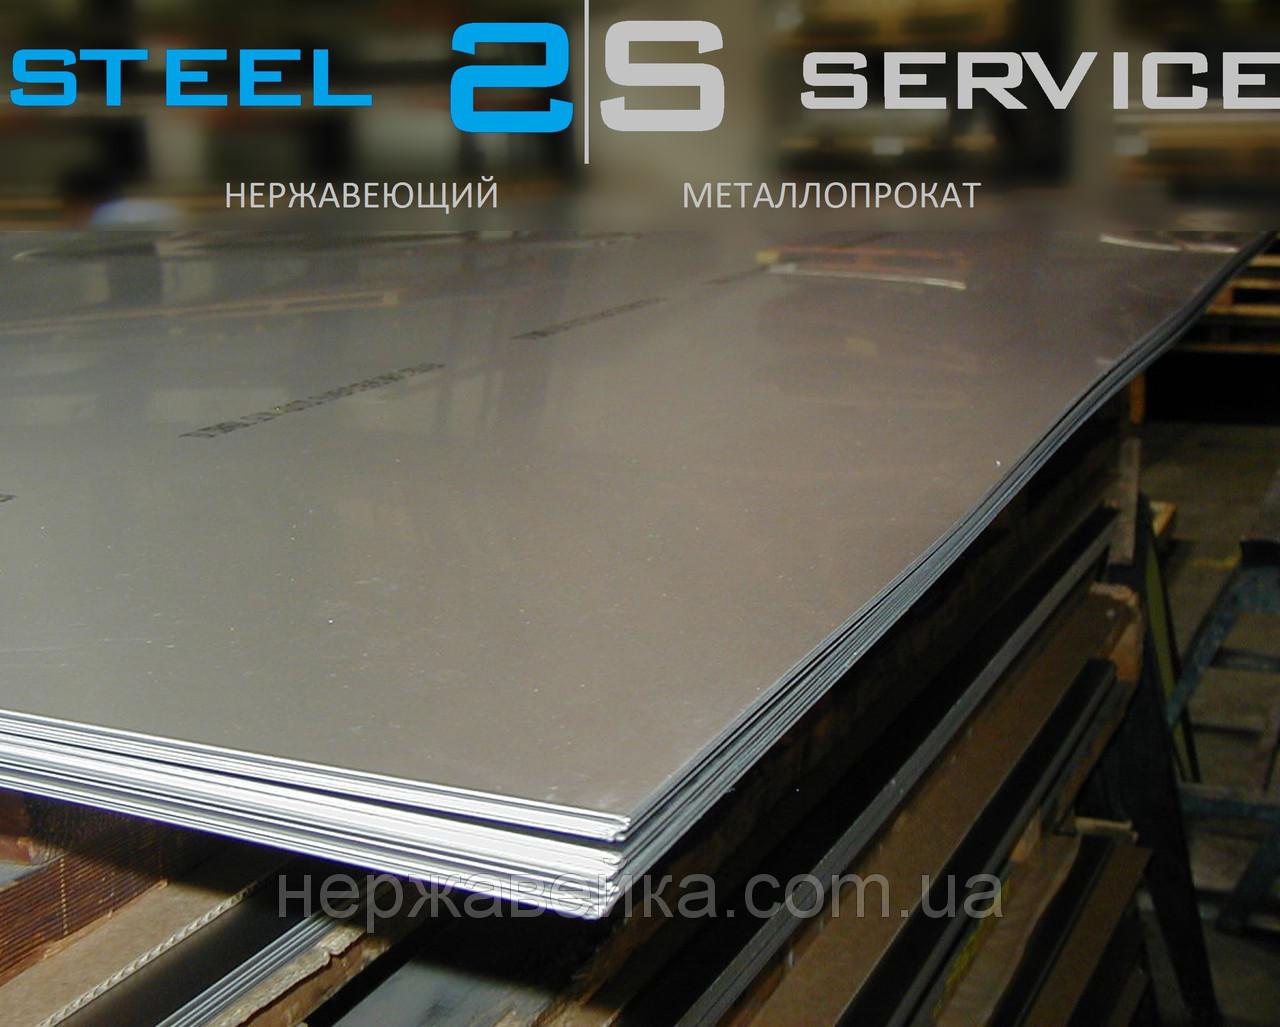 Нержавейка лист 8х1250х2500мм  AISI 316Ti(10Х17Н13М2Т) F1 - горячекатанный,  кислотостойкий